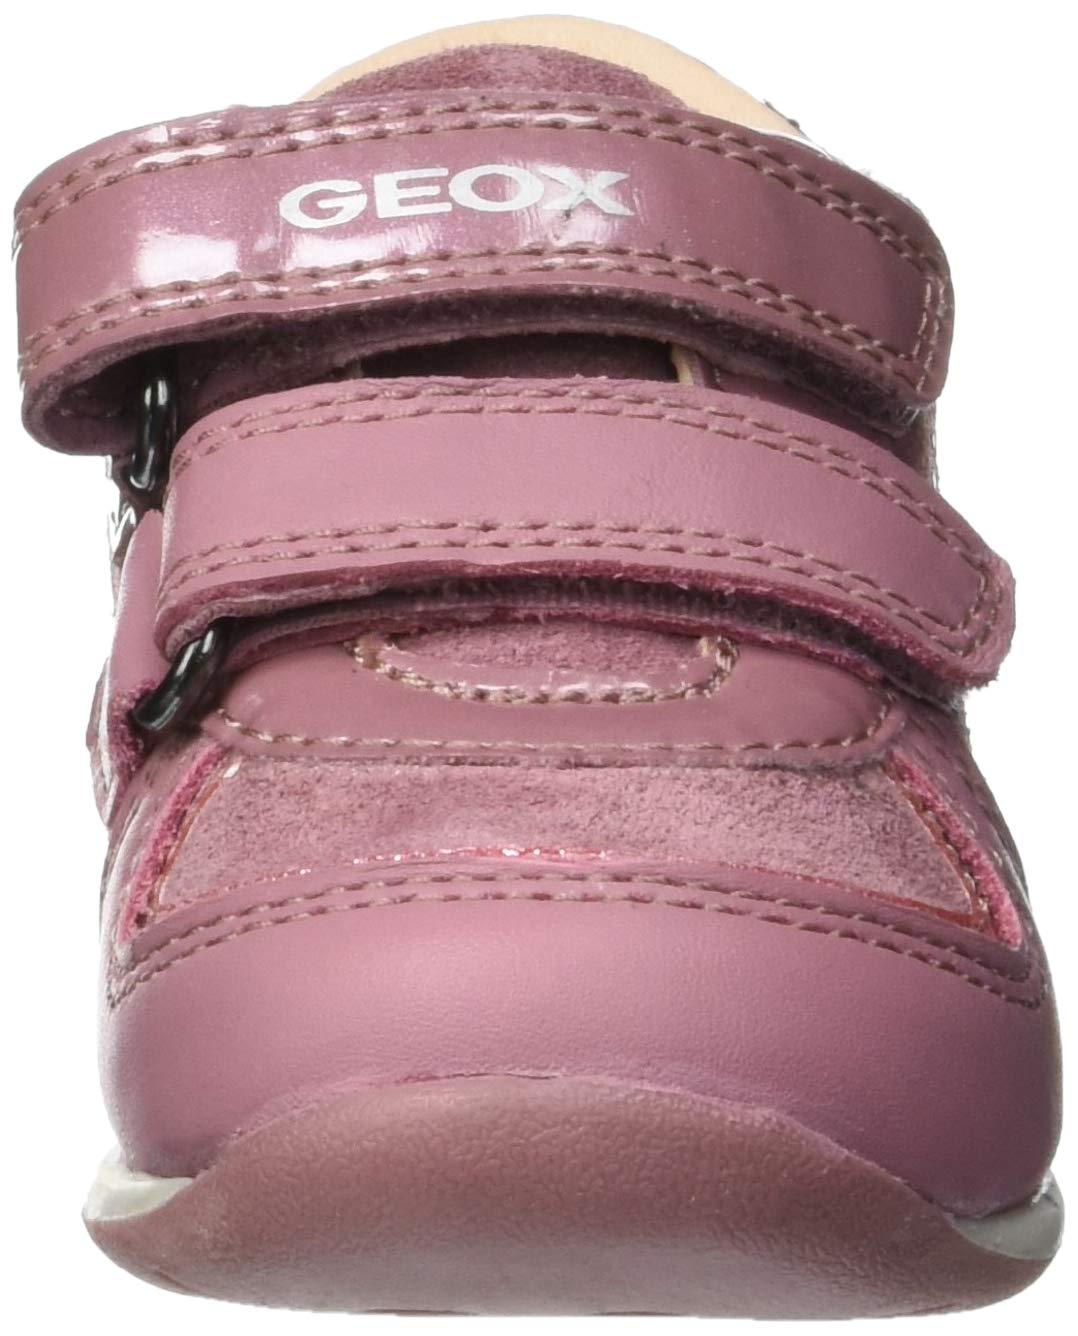 Geox B Each B, Bailarinas para Bebés